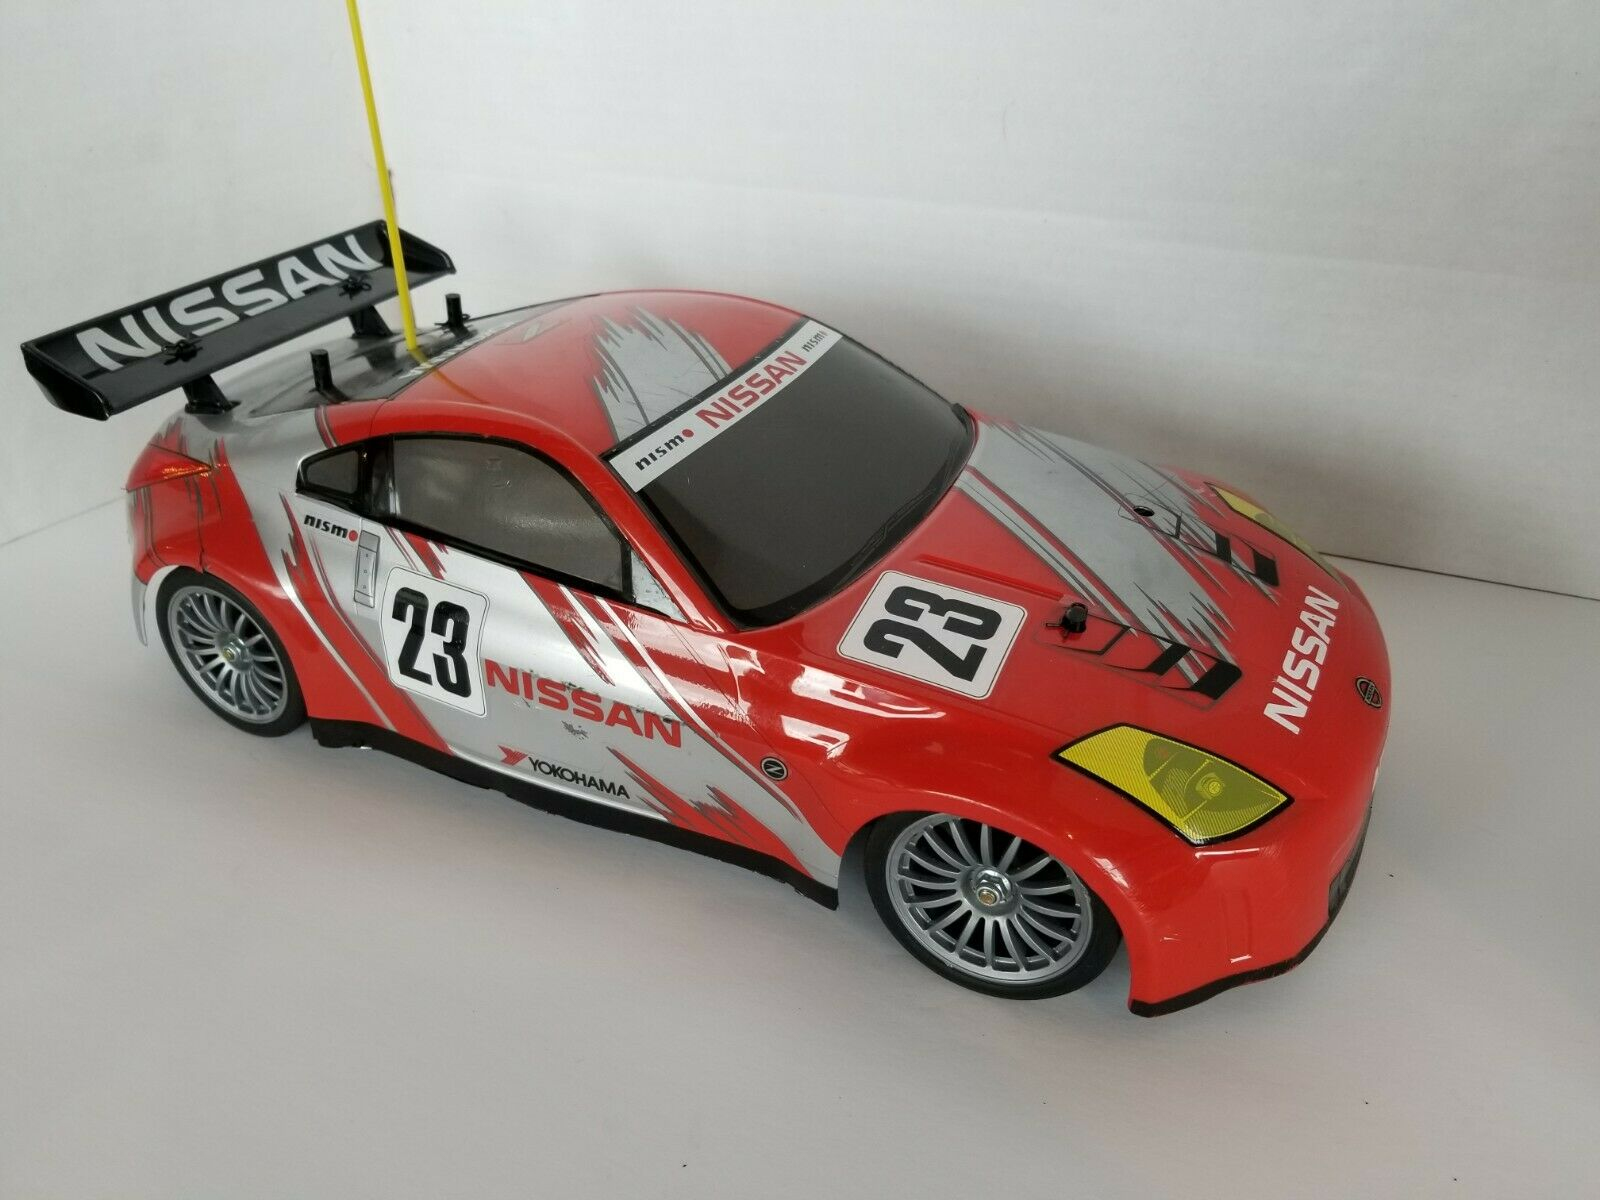 Tamiya TGS Nitro Glow 1/10 RC Race Car with radio and access